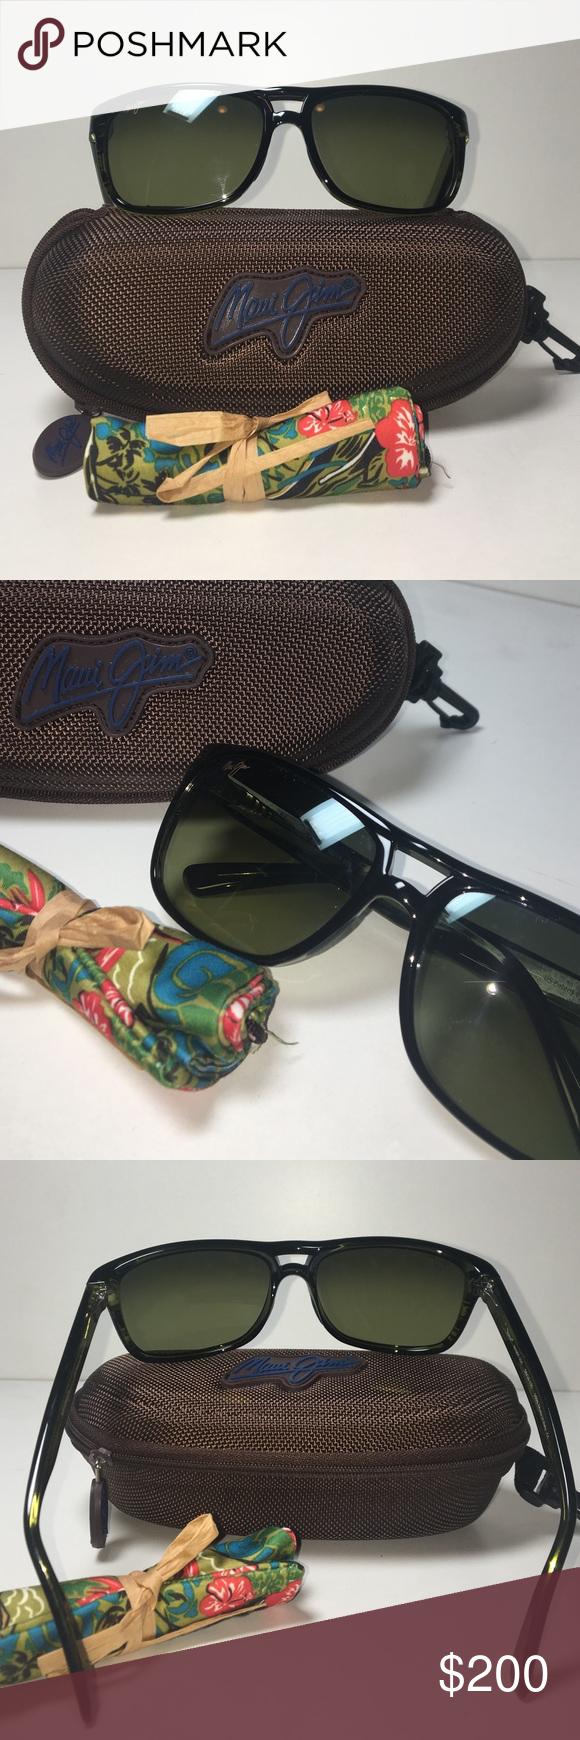 ✨ NEW ✨ Maui Jim Waterways sunglasses NWT | Pinterest